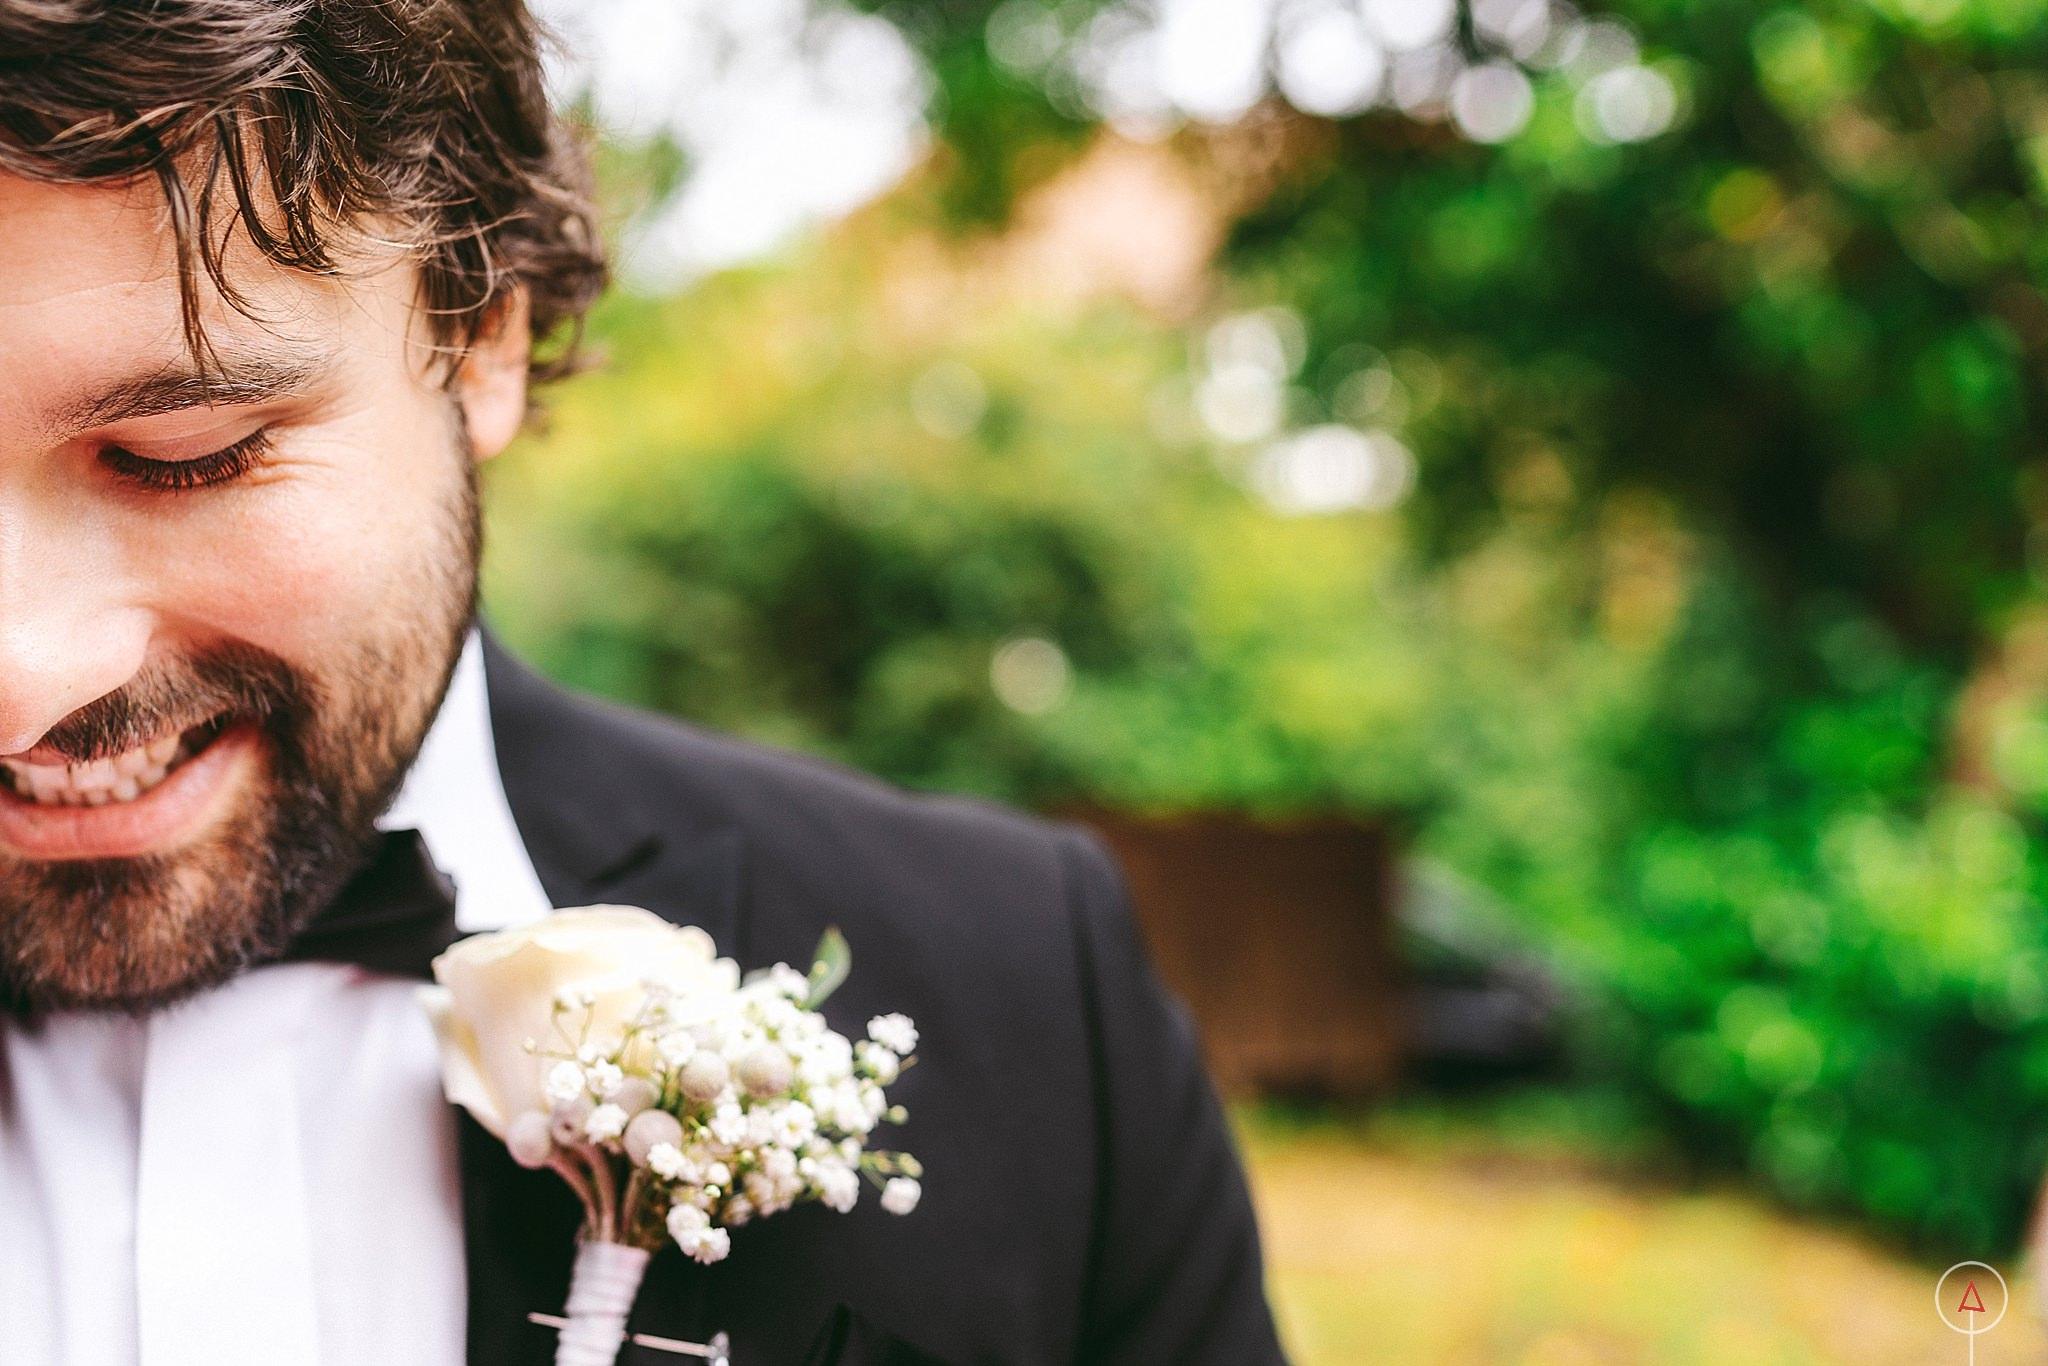 cardiff-wedding-photographer-aga-tomaszek_0354